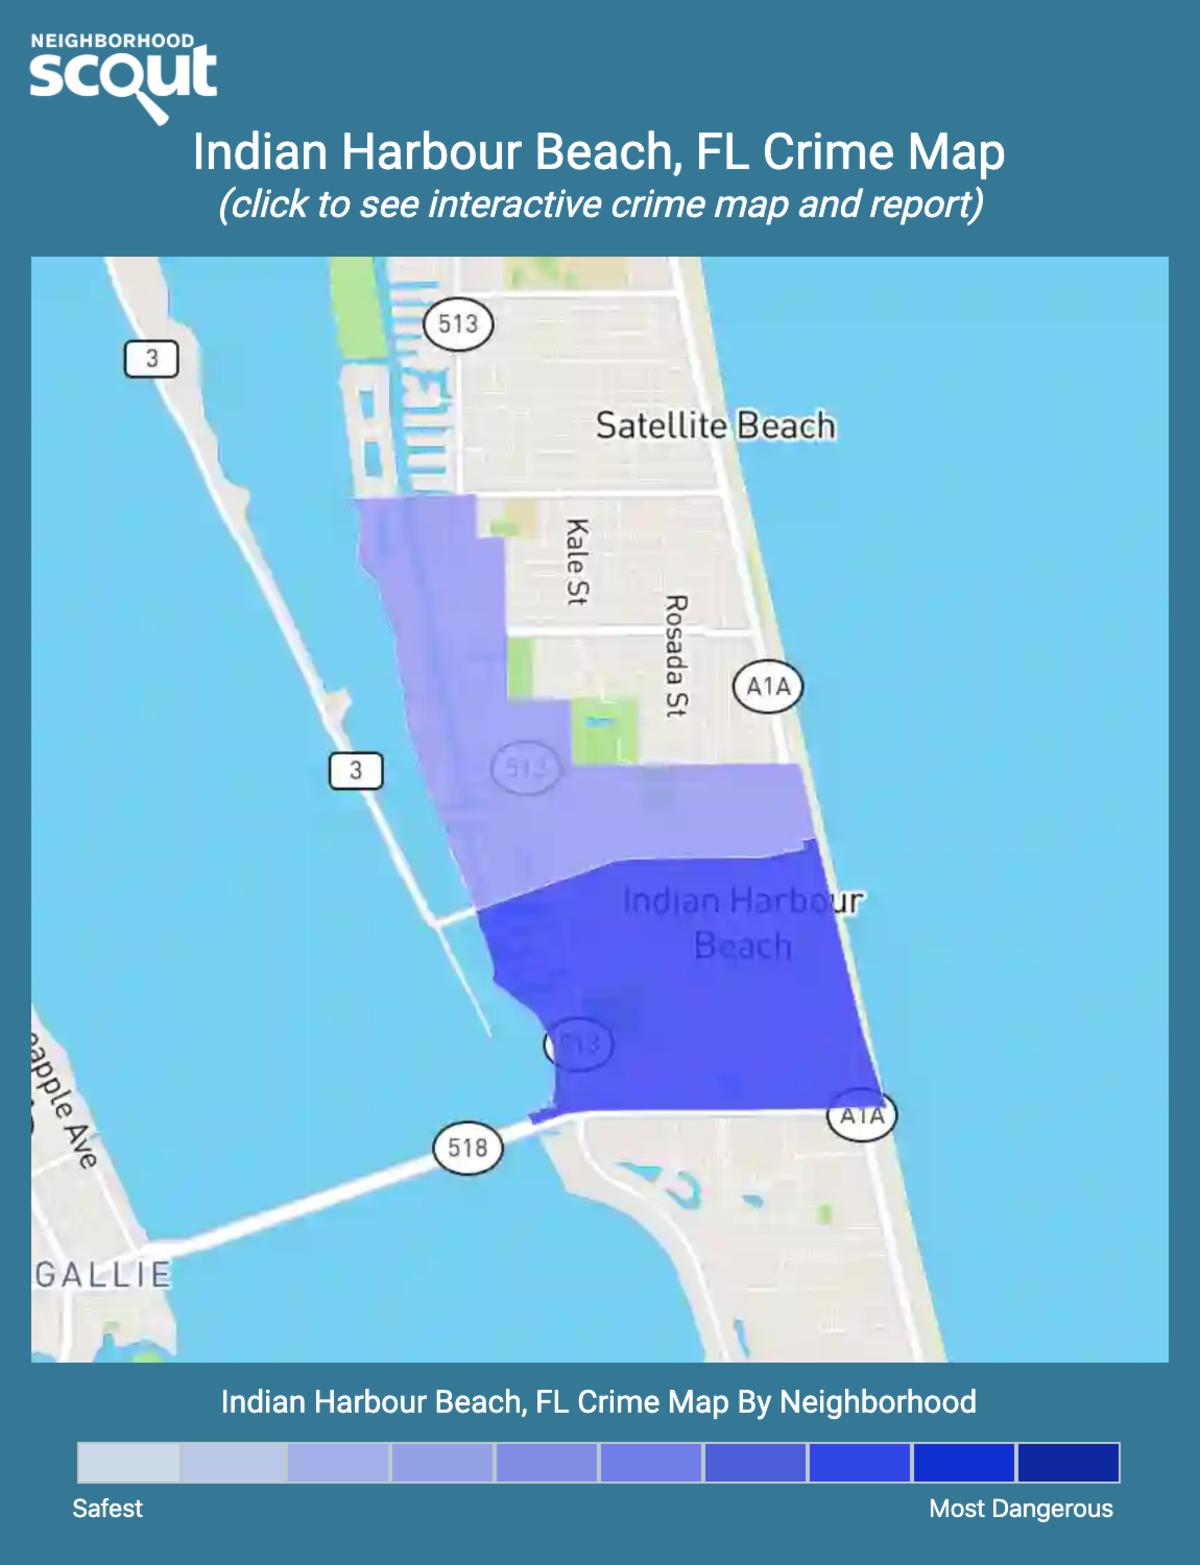 Indian Harbour Beach, Florida crime map